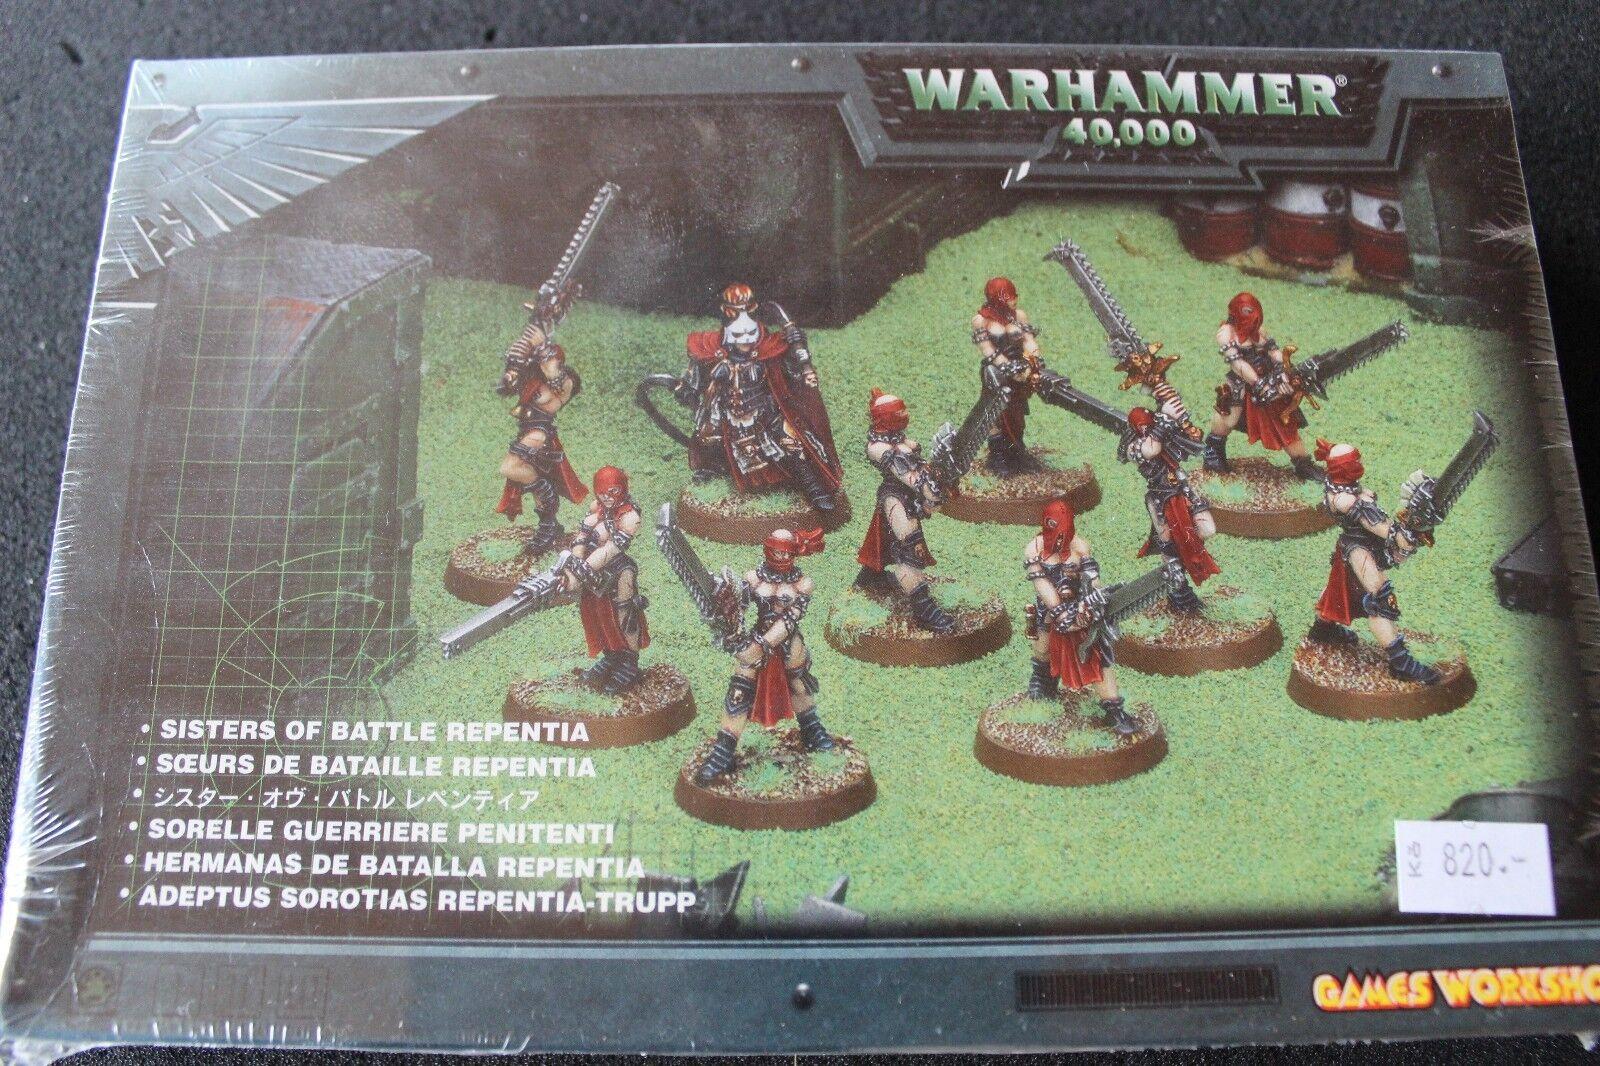 Games workshop warhammer 40k sisters of battle sisters repentia 10  metal figures  autorisation officielle